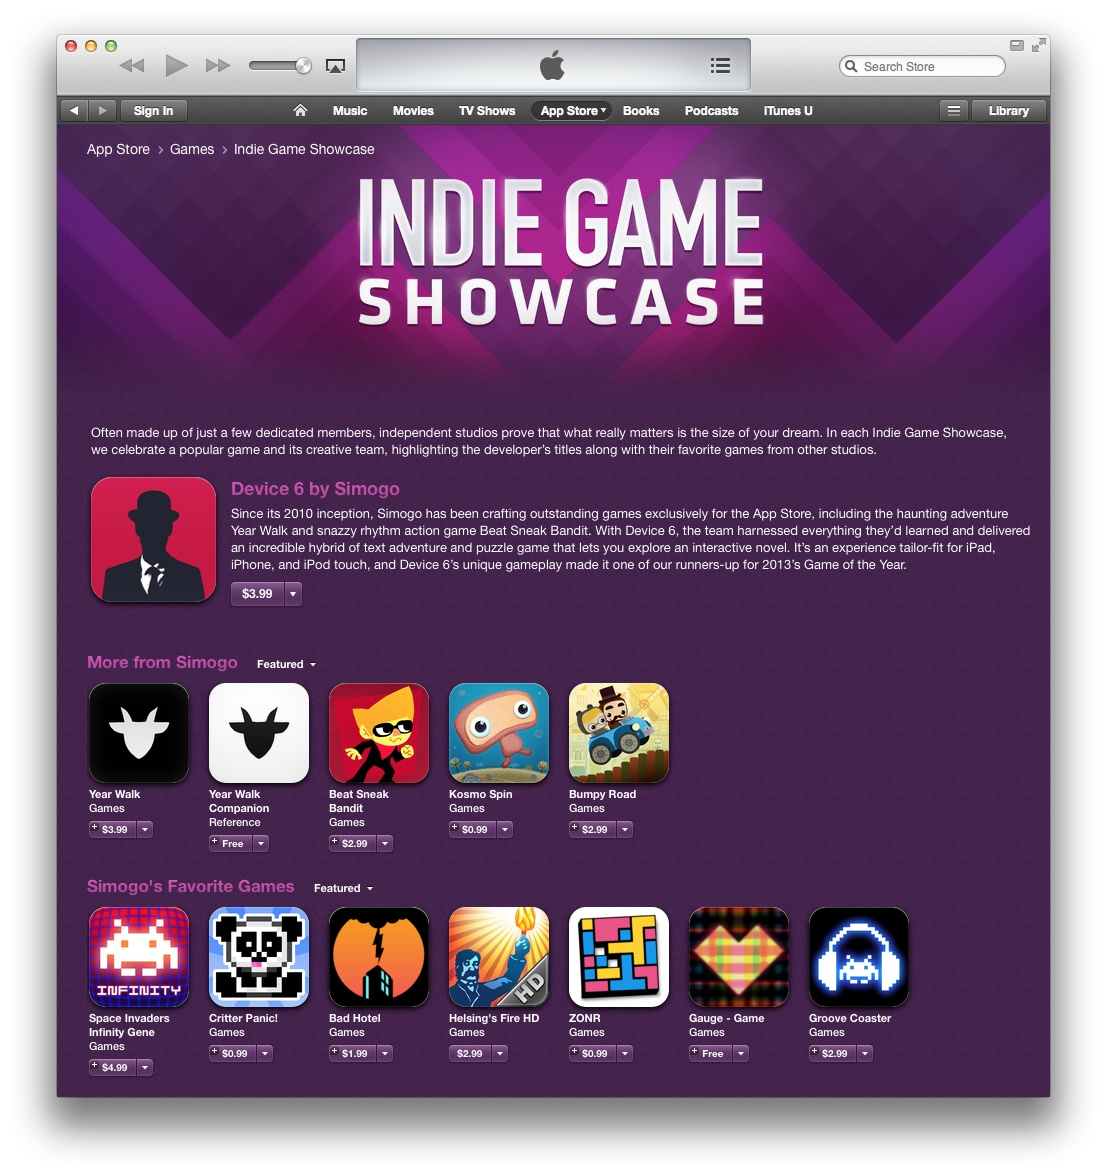 App Store (Indie Game Showcase, desktop iTunes screenshot)